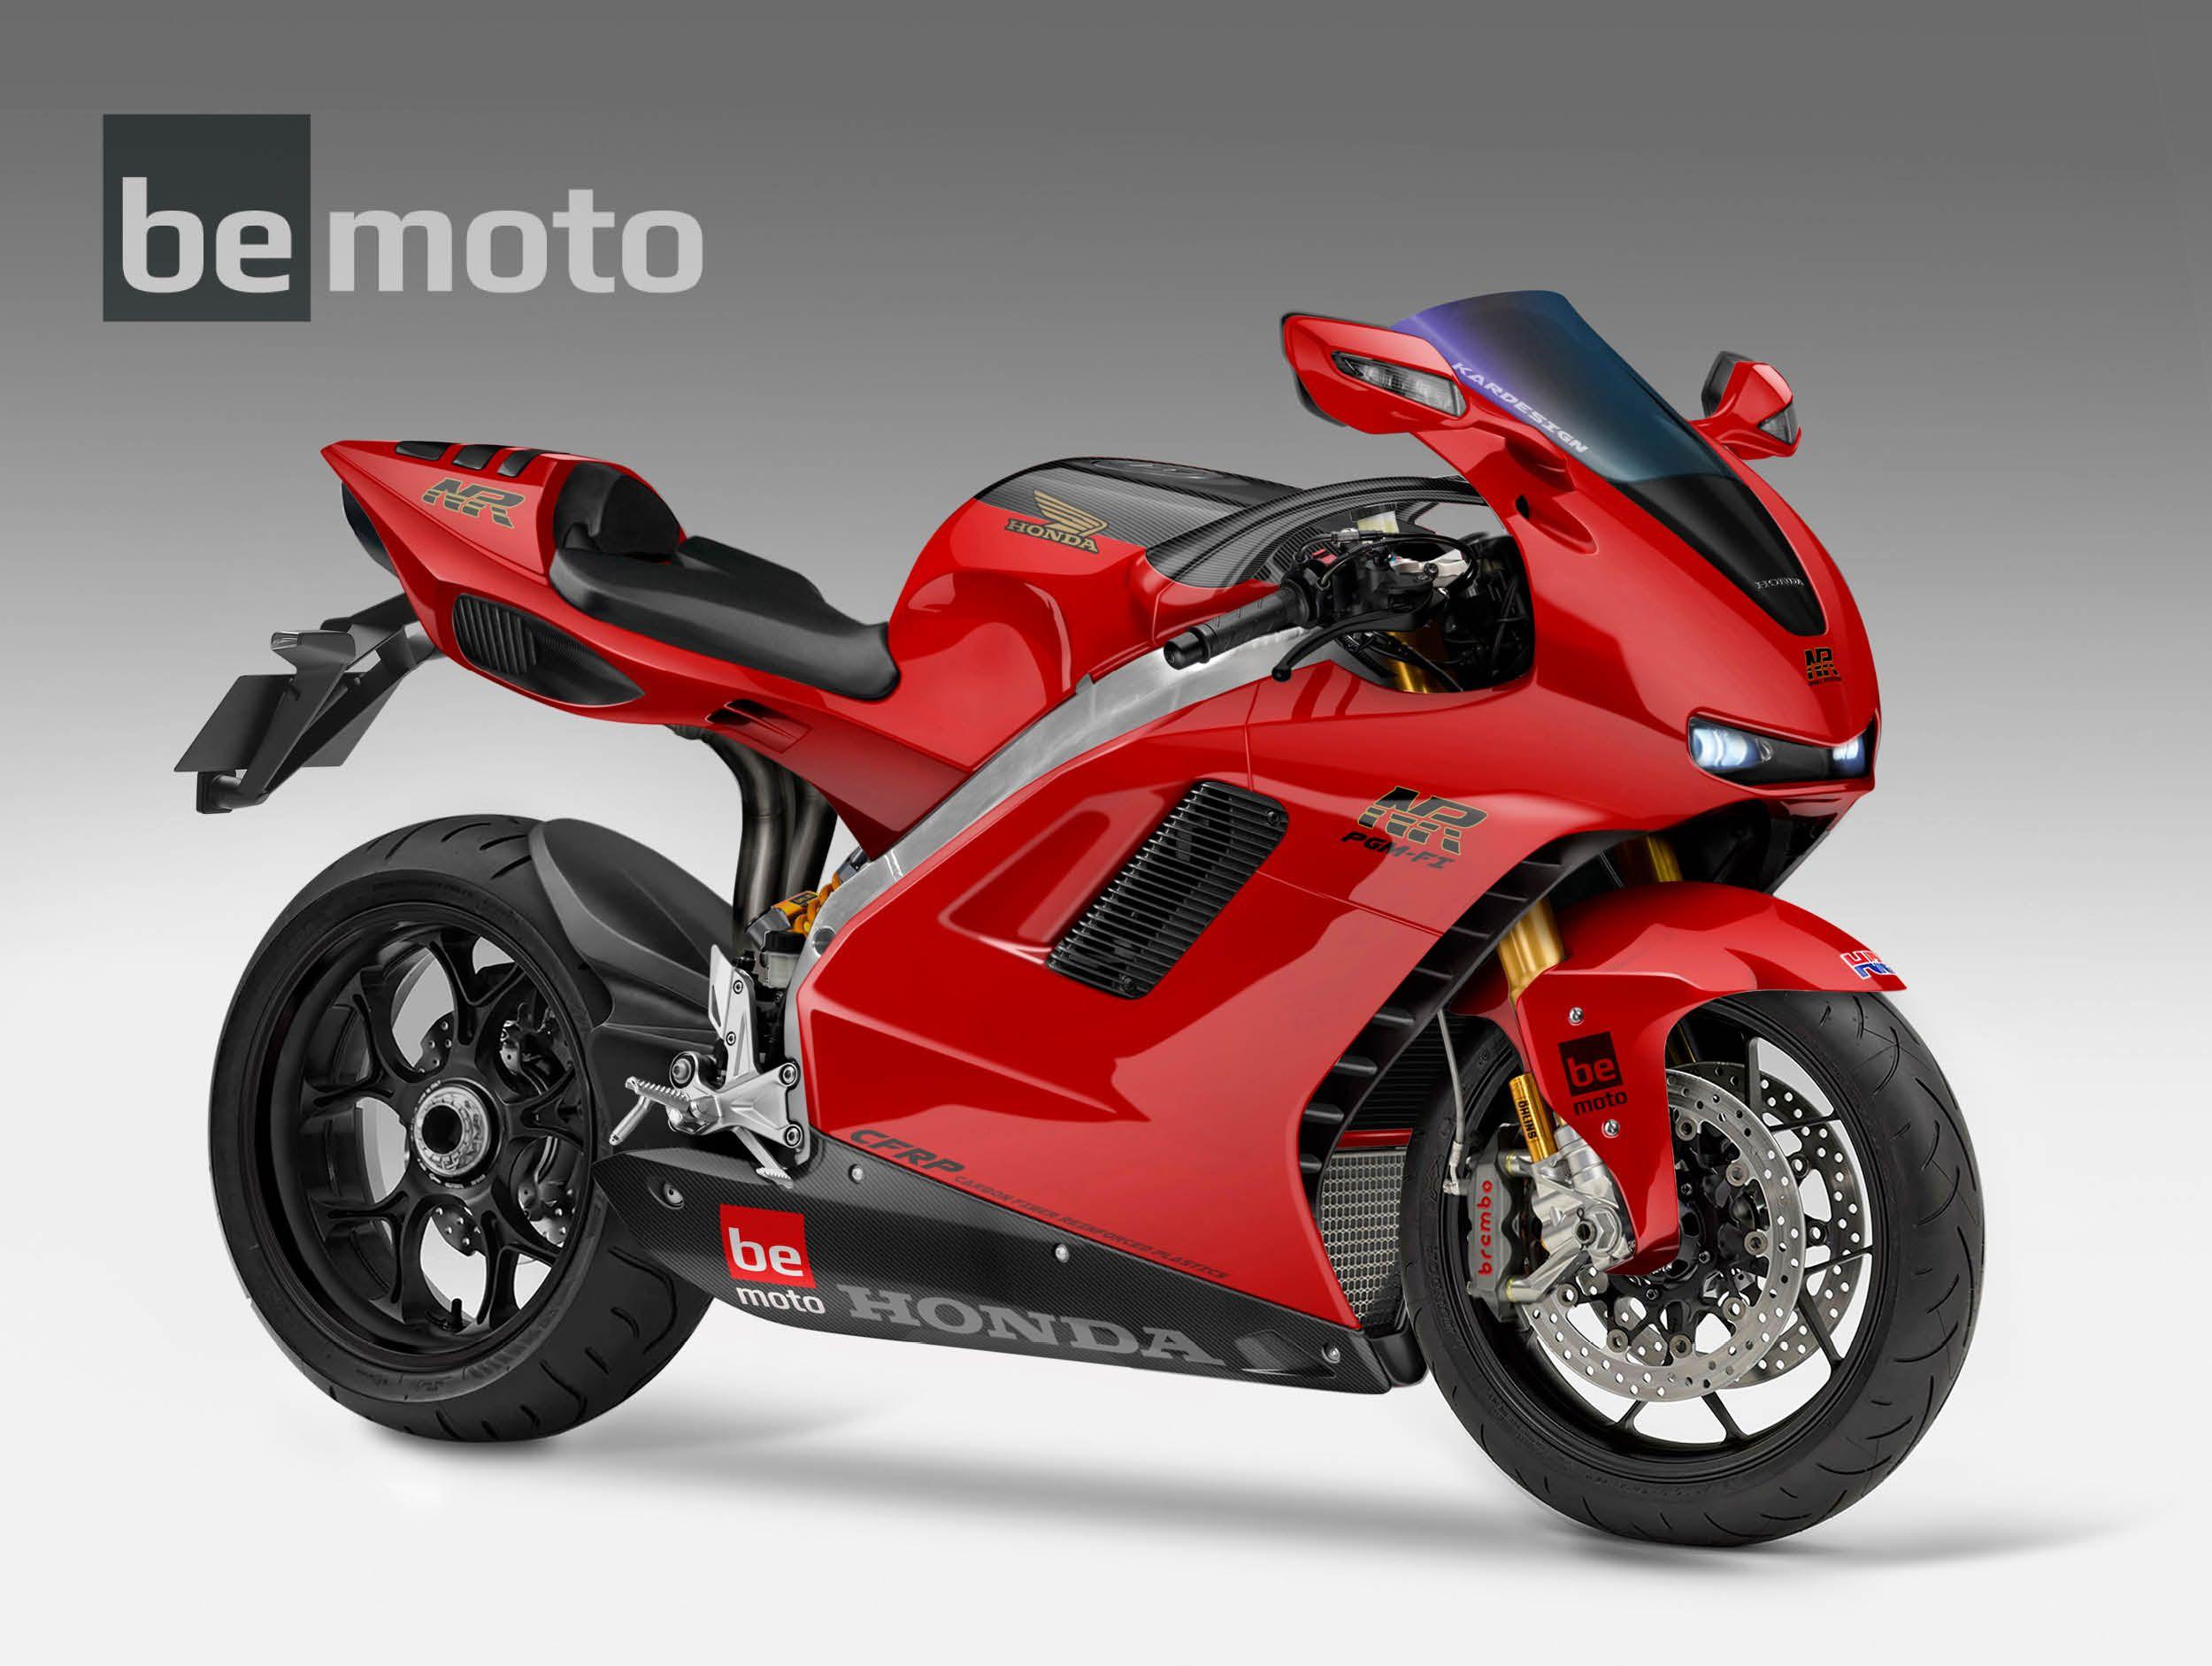 2020 Honda Nr1000 V4 Oval Piston Concept Bike Bemoto Motorcycles Information Nr750 Red